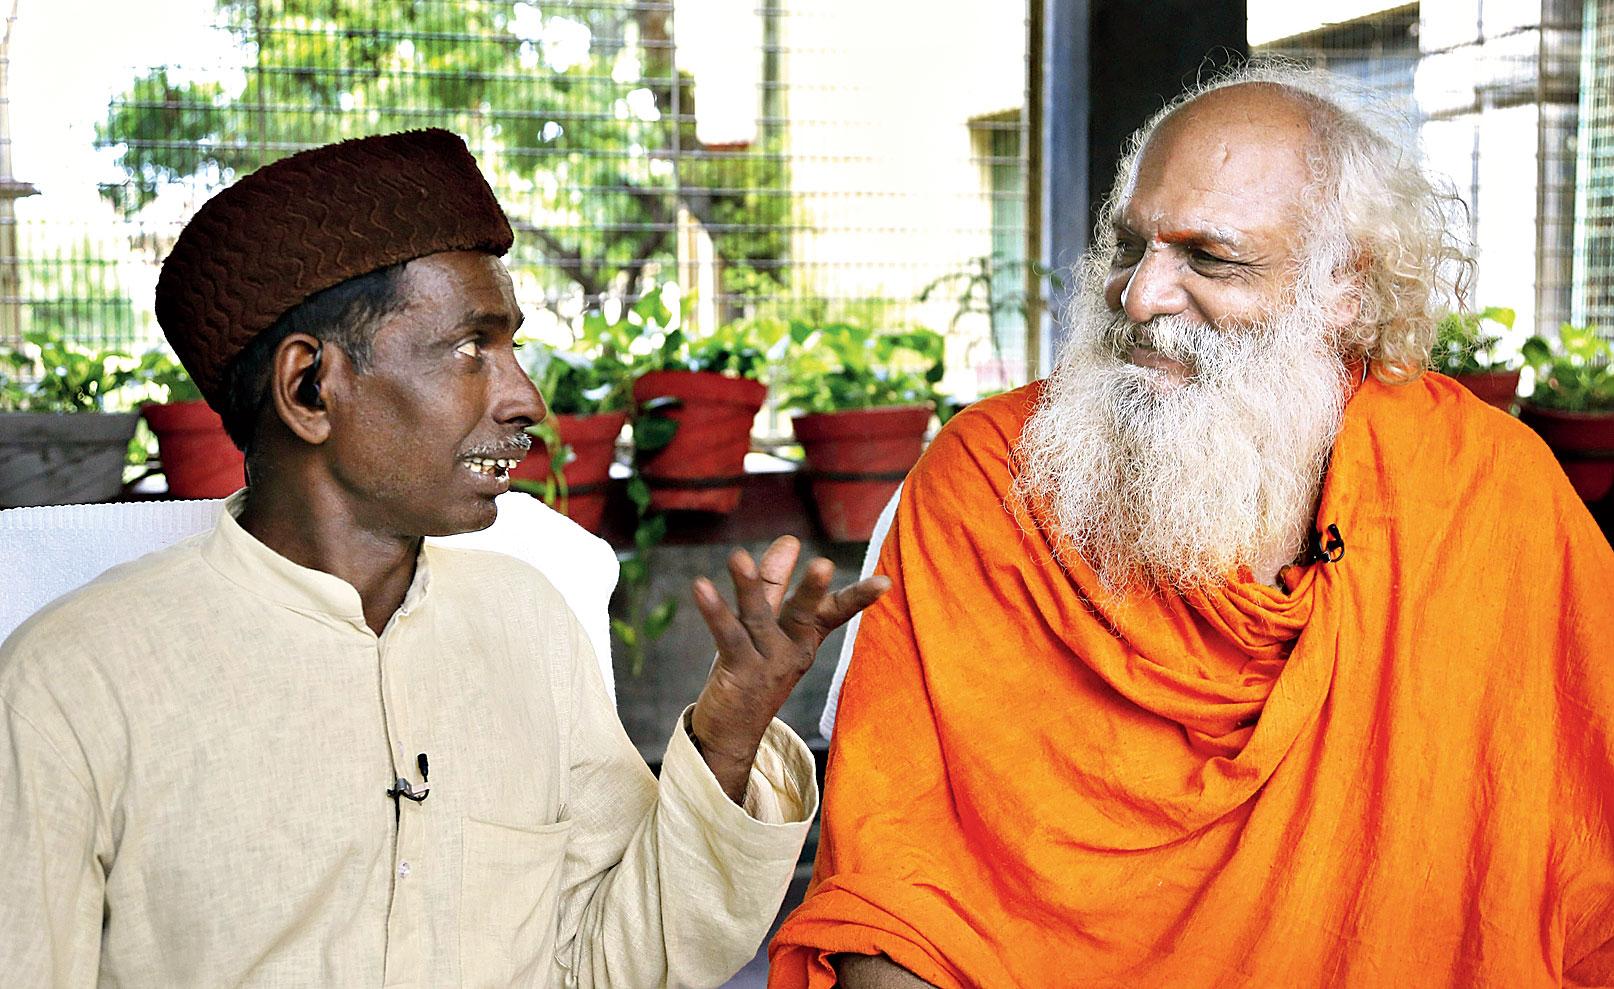 Shrine case relook vetoed 2:1, Ayodhya on course